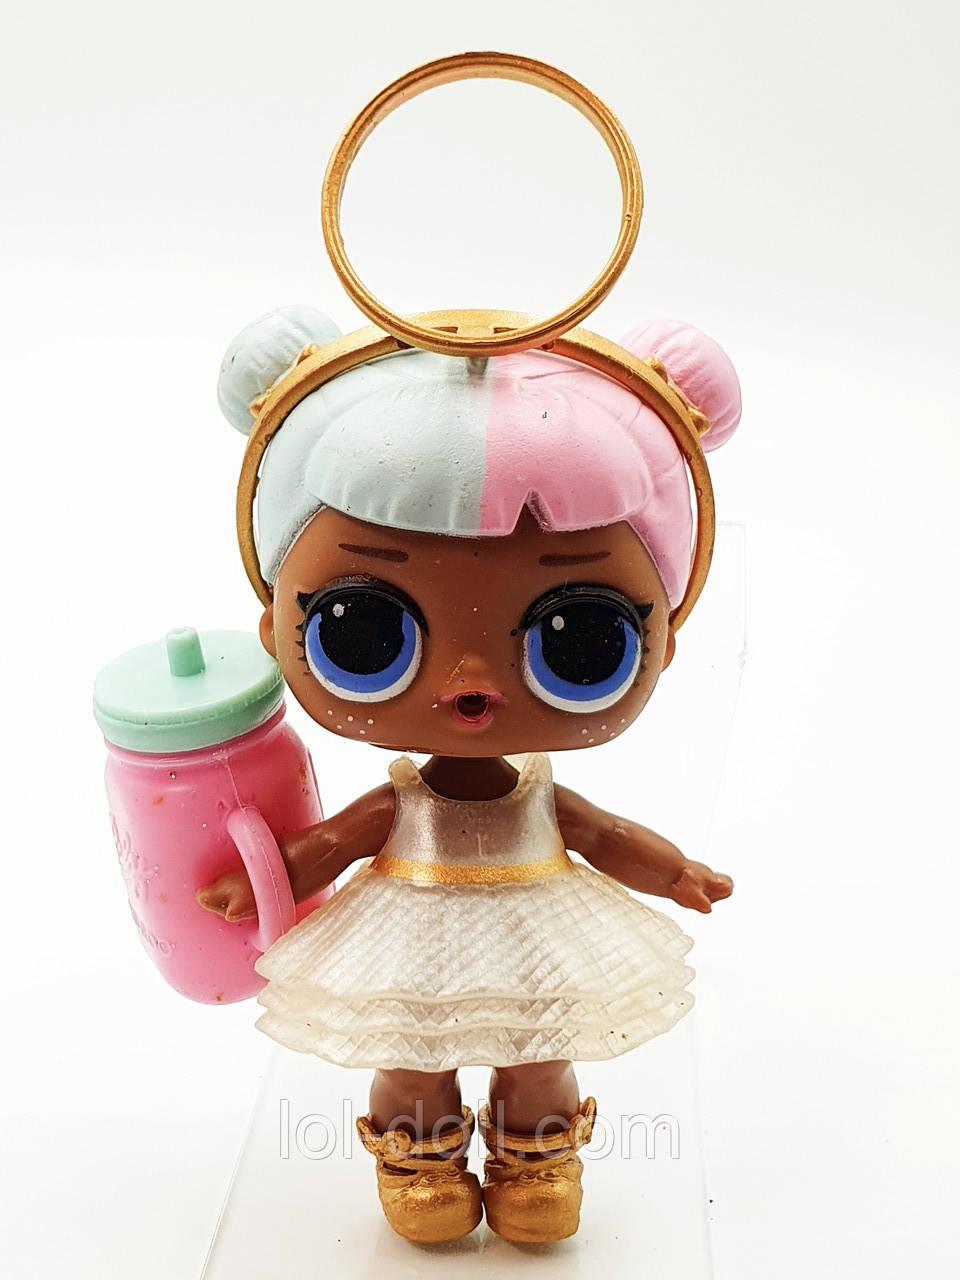 Кукла LOL Surprise 2 Серия LOL Surprise Surag - Сахарок, конфетка Лол Сюрприз Без Шара Оригинал